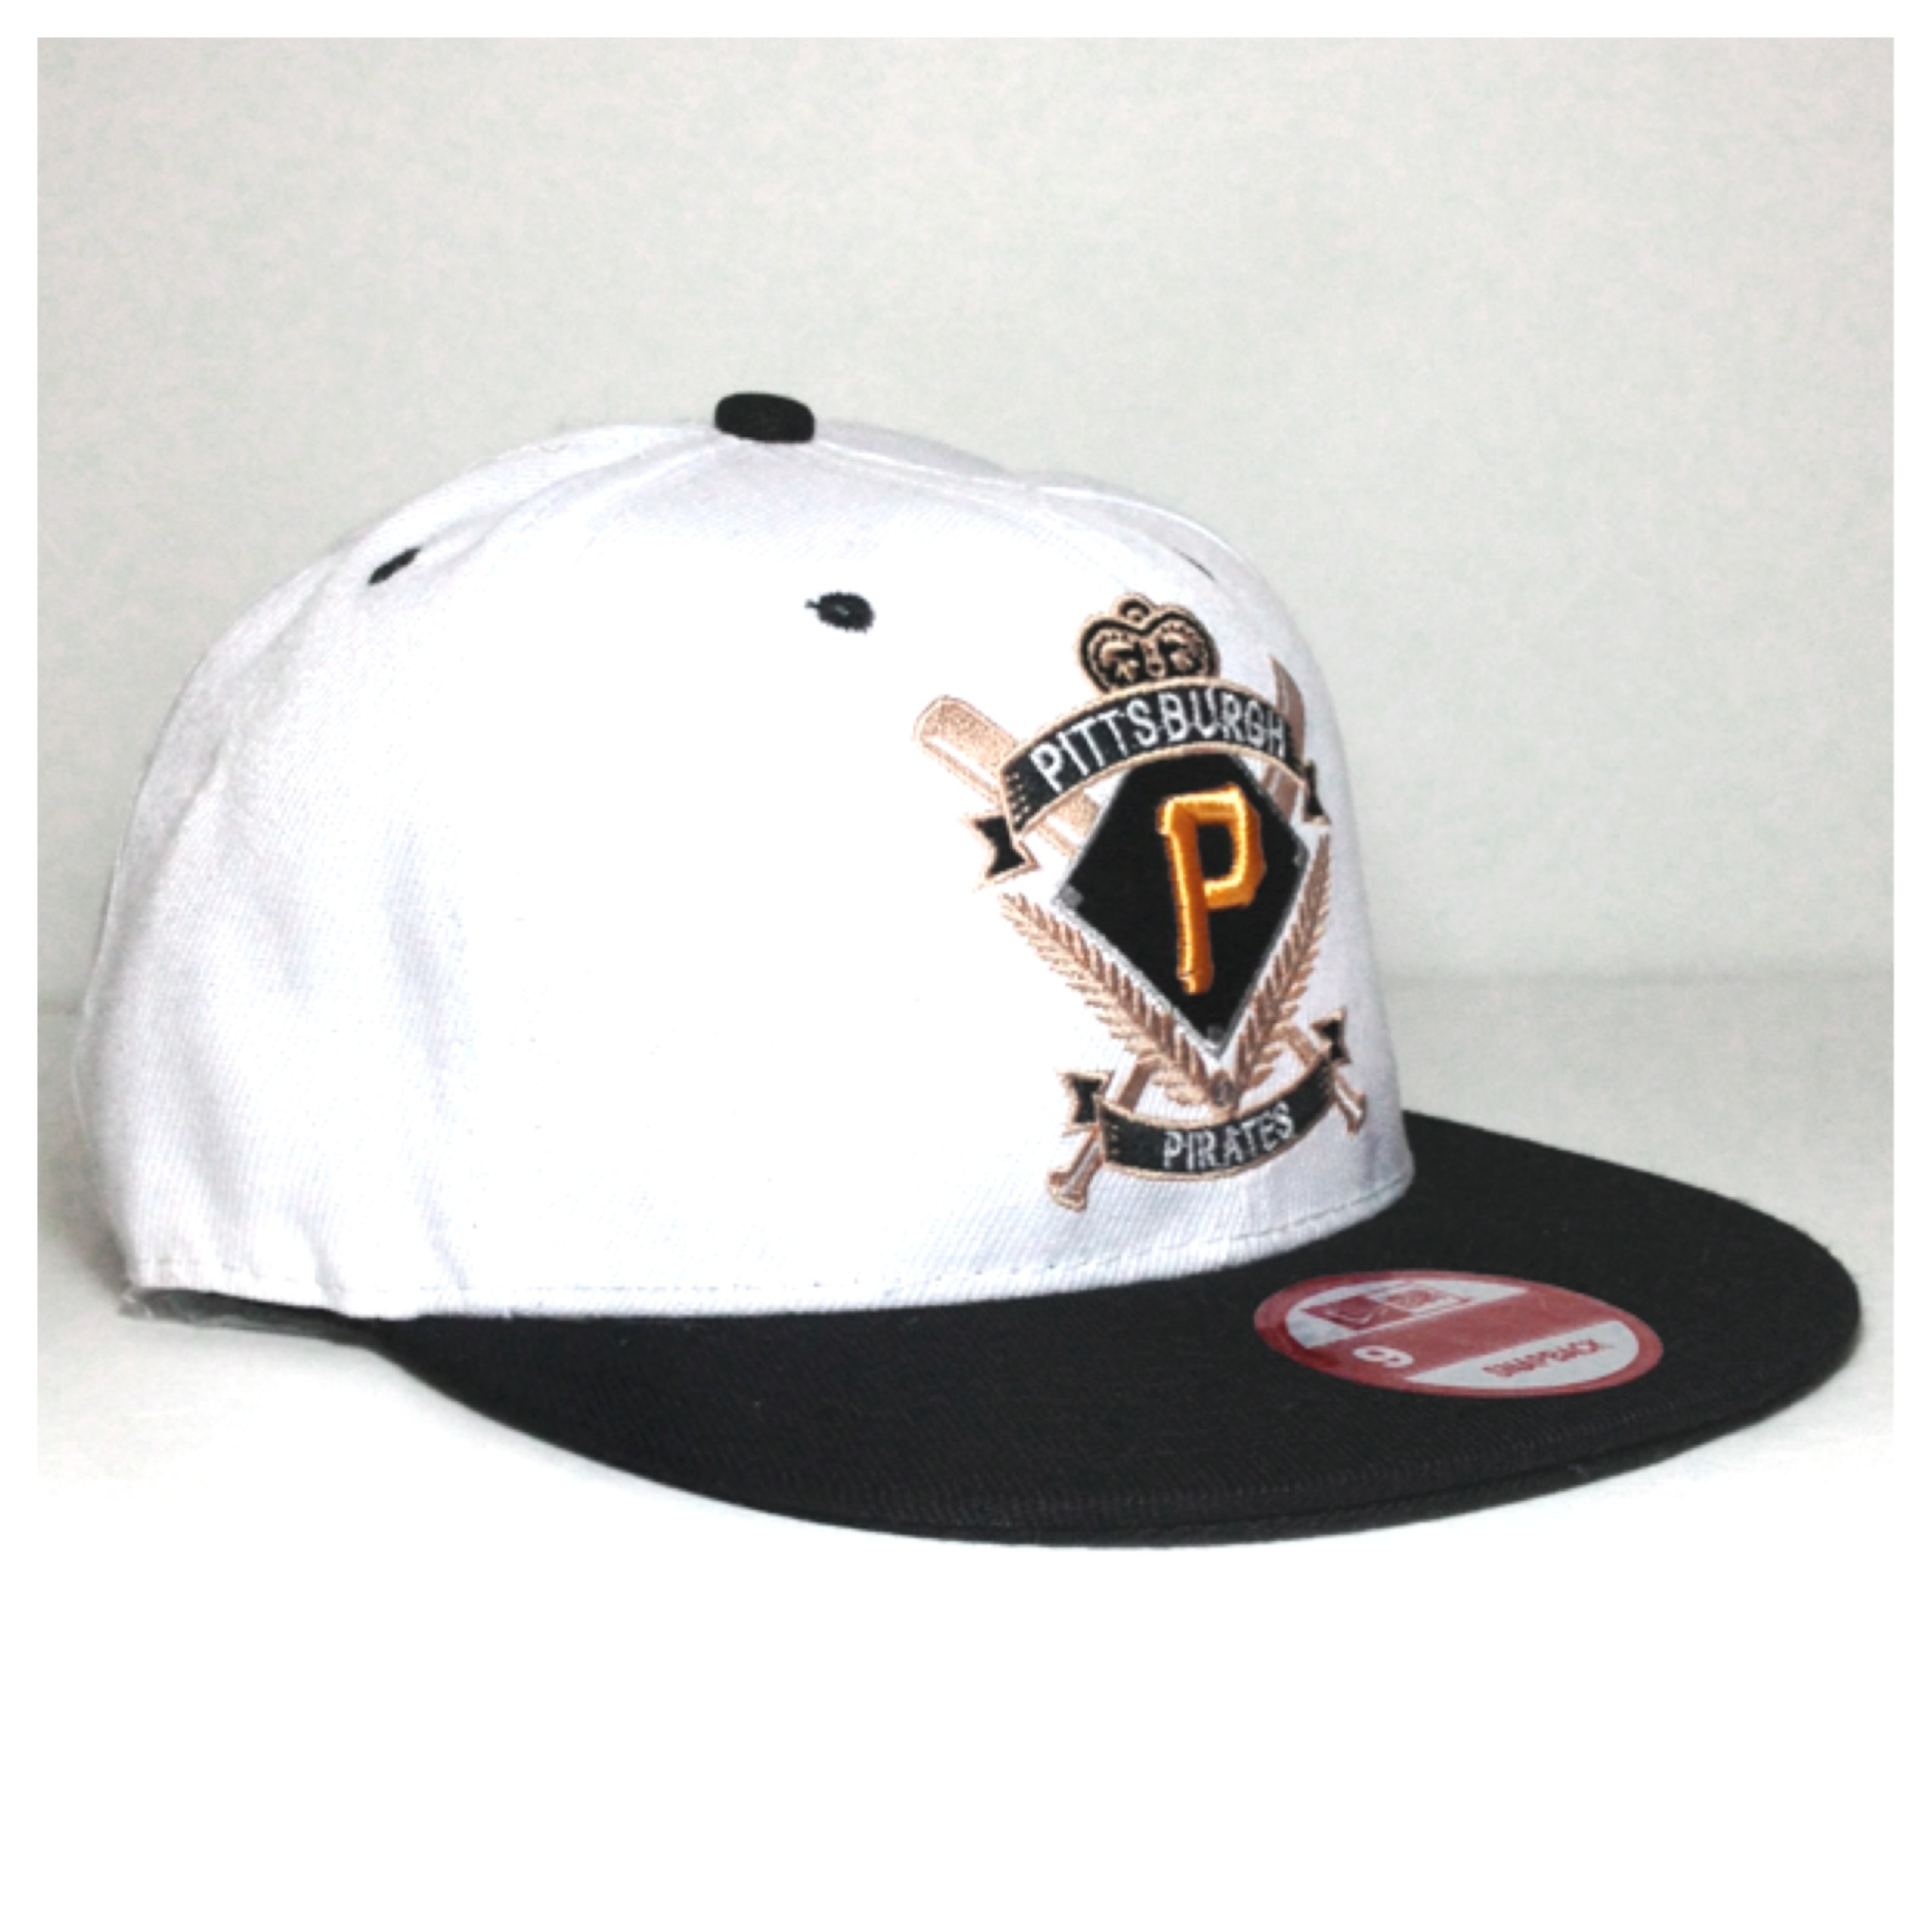 002 MLB Pittsburgh Pirates Snapback · Tiger s Discount Store ... 3b55fe64c57